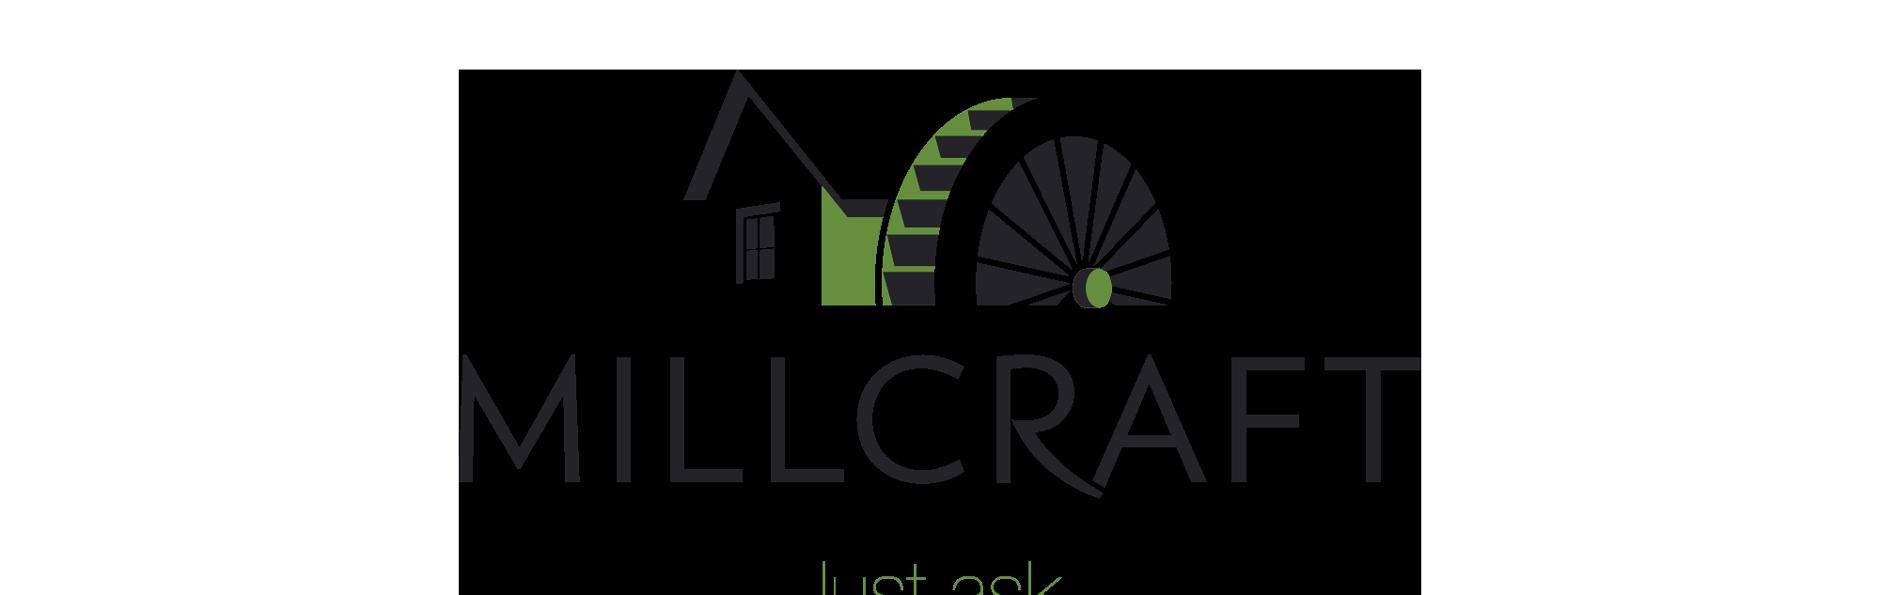 Millcraft Logo Rebrand | Company Rebranding